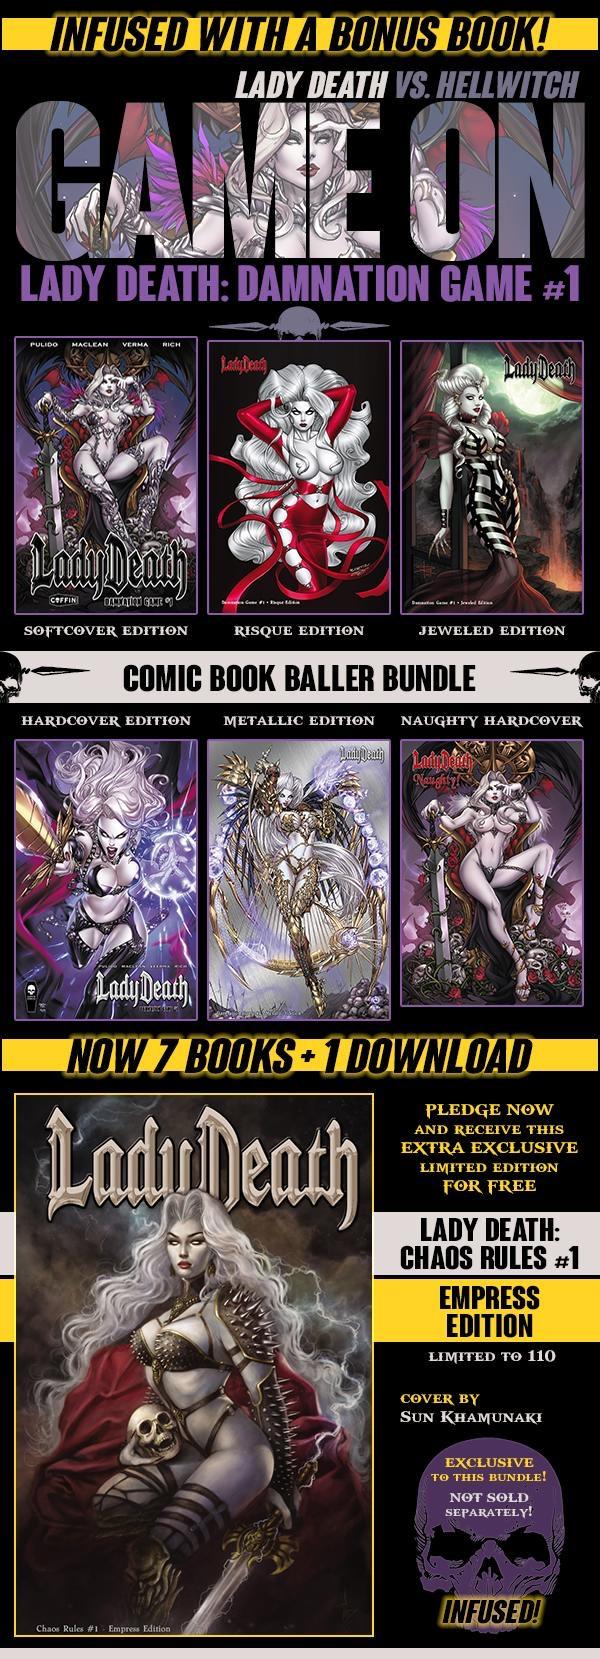 COMIC BOOK BALLER BUNDLE ($250 PLEDGE)